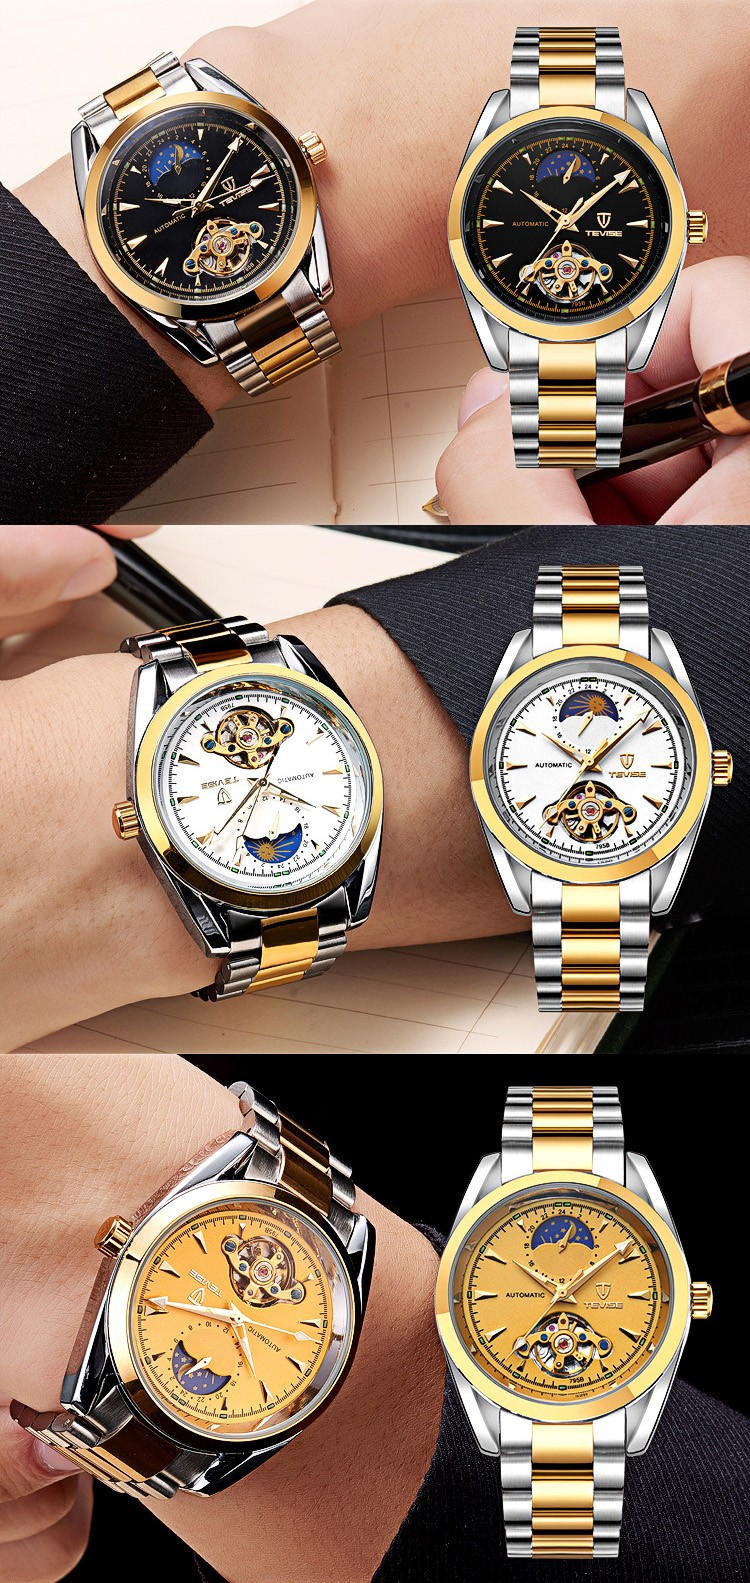 Relogio Masculino TEVISE Люксовый Бренд Часы Мужчины Tourbillon автоматические Механические часы Moon Phase Скелет наручные часы часы